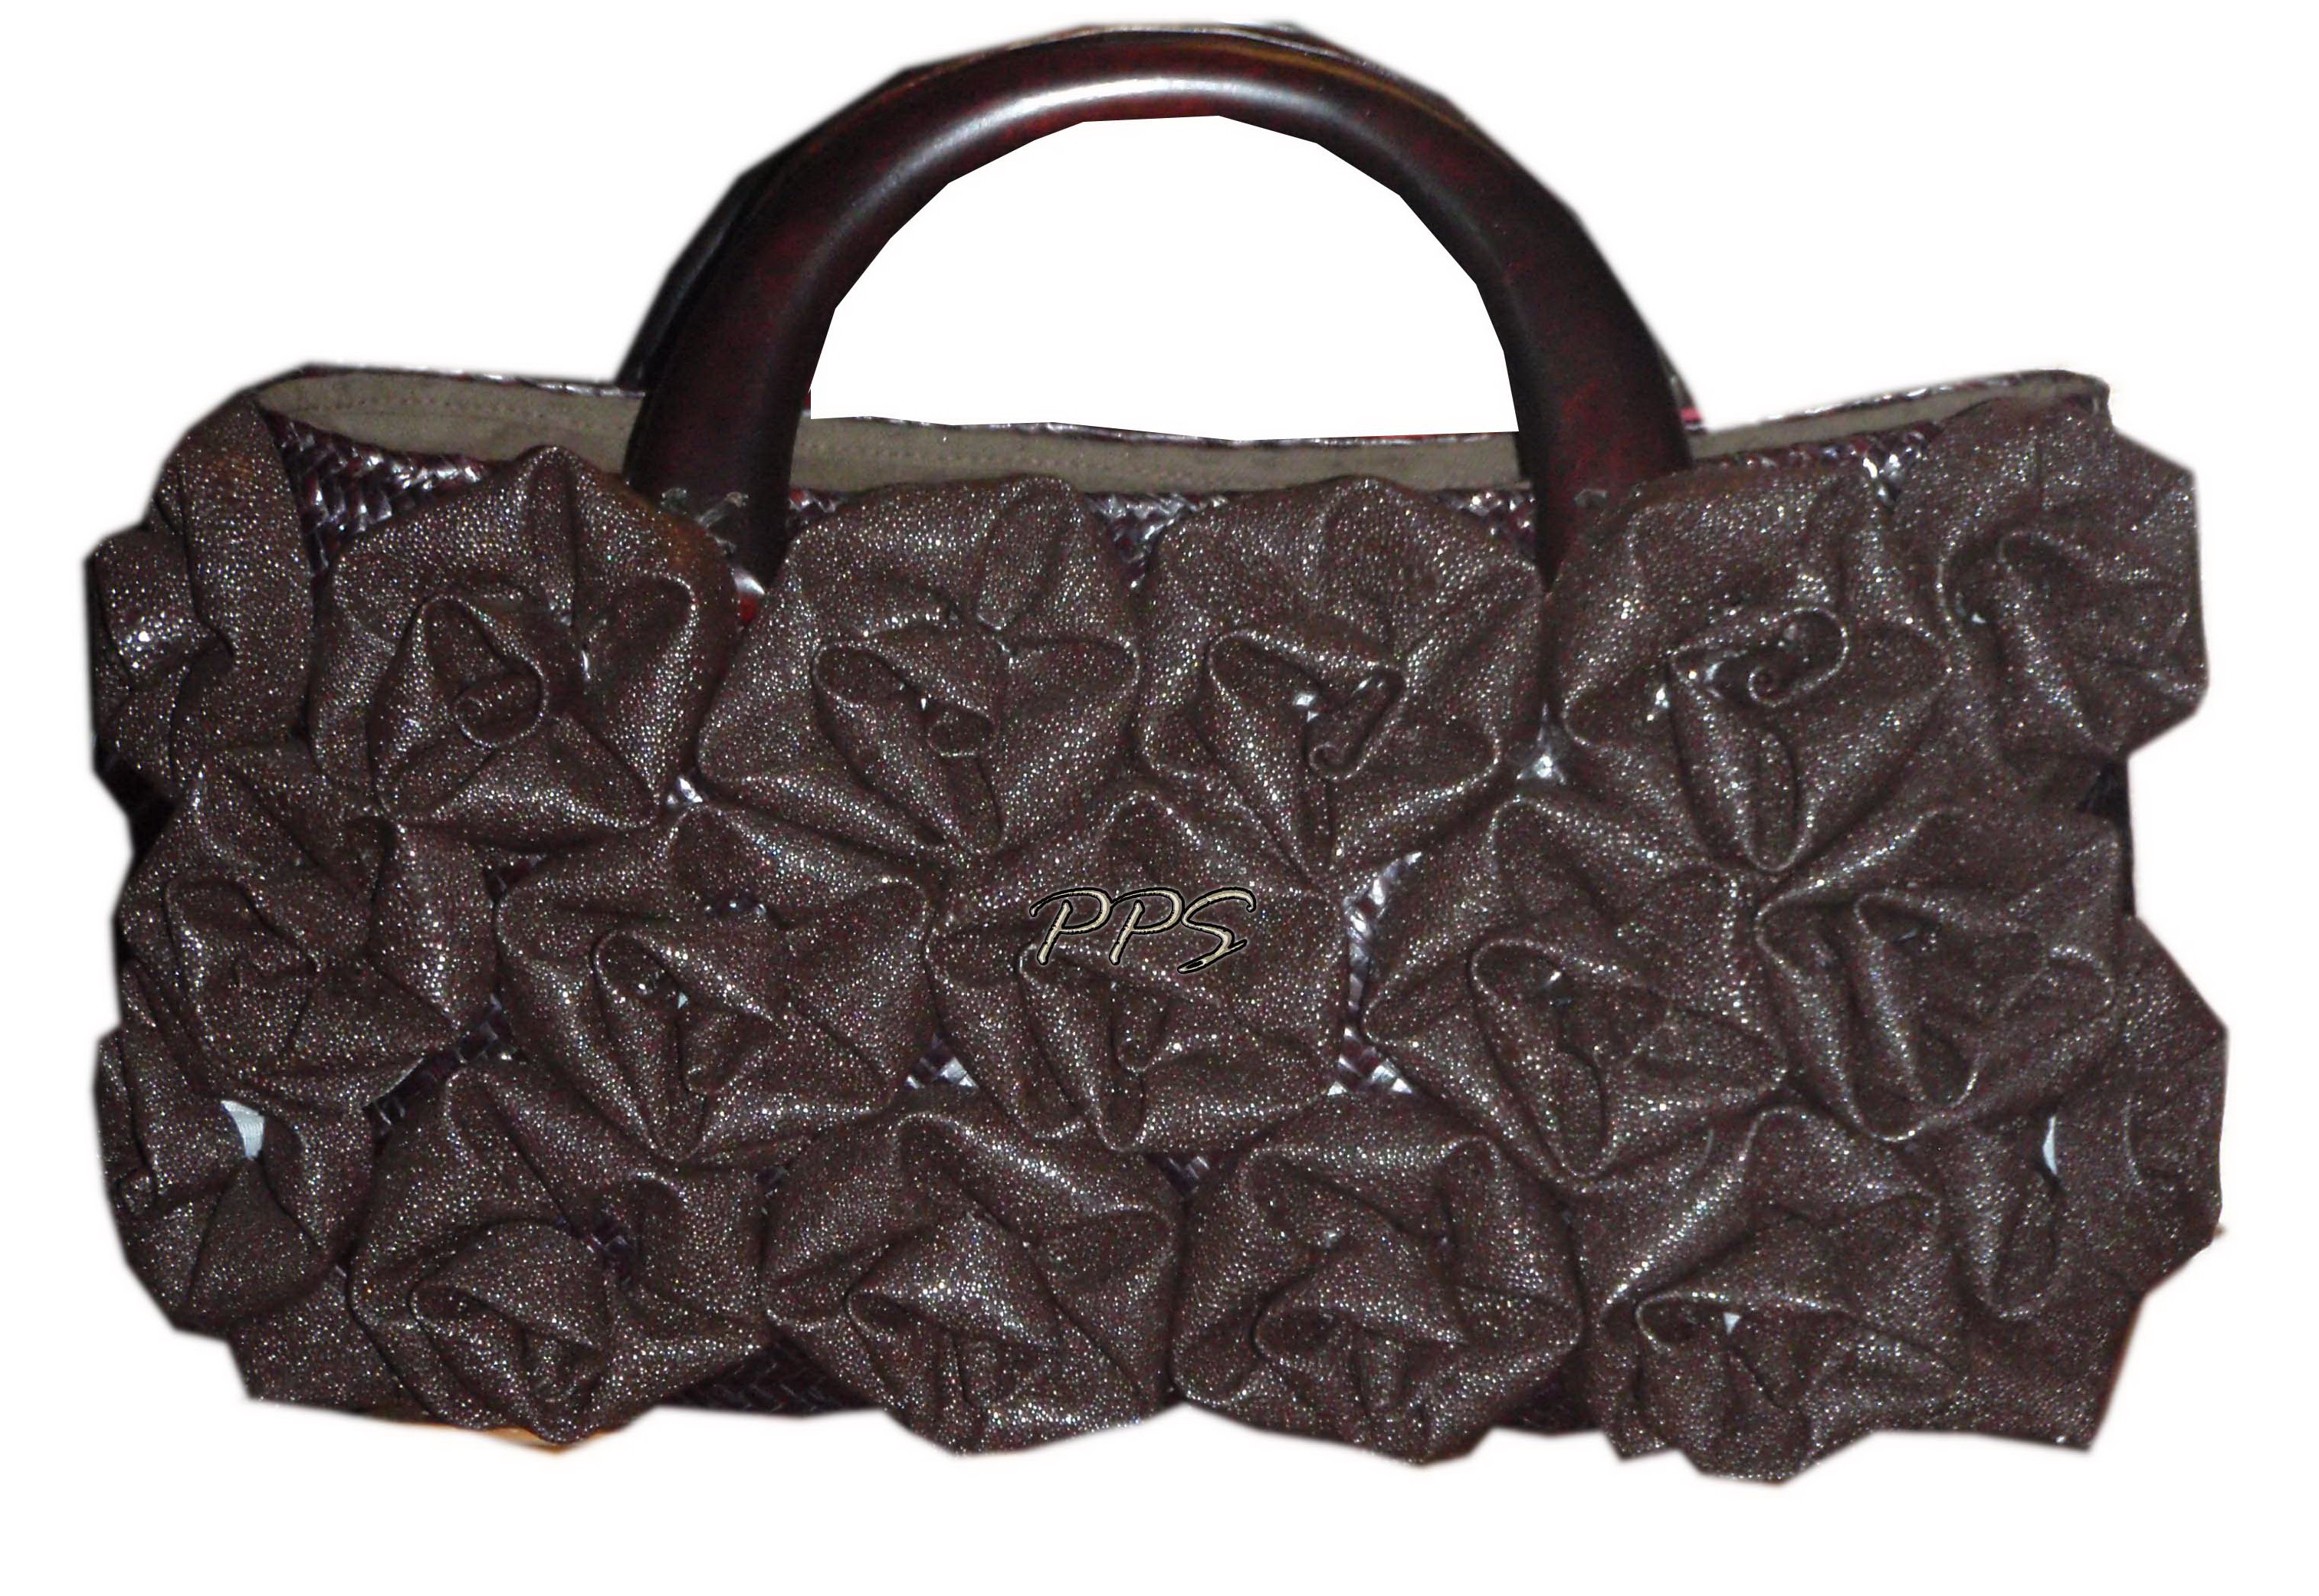 Seagrass and PU-Bag-PPS bag brand14